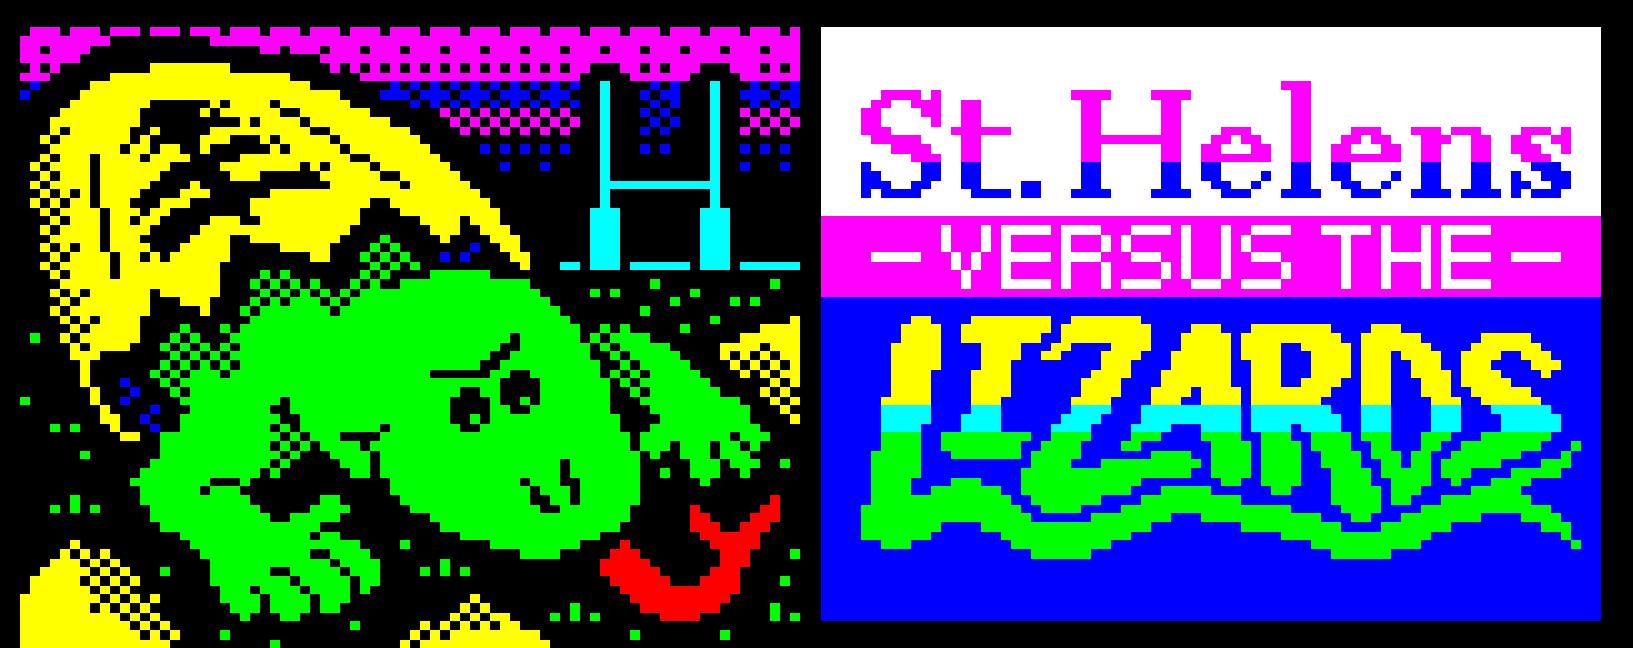 St Helens v Lizards horizontal